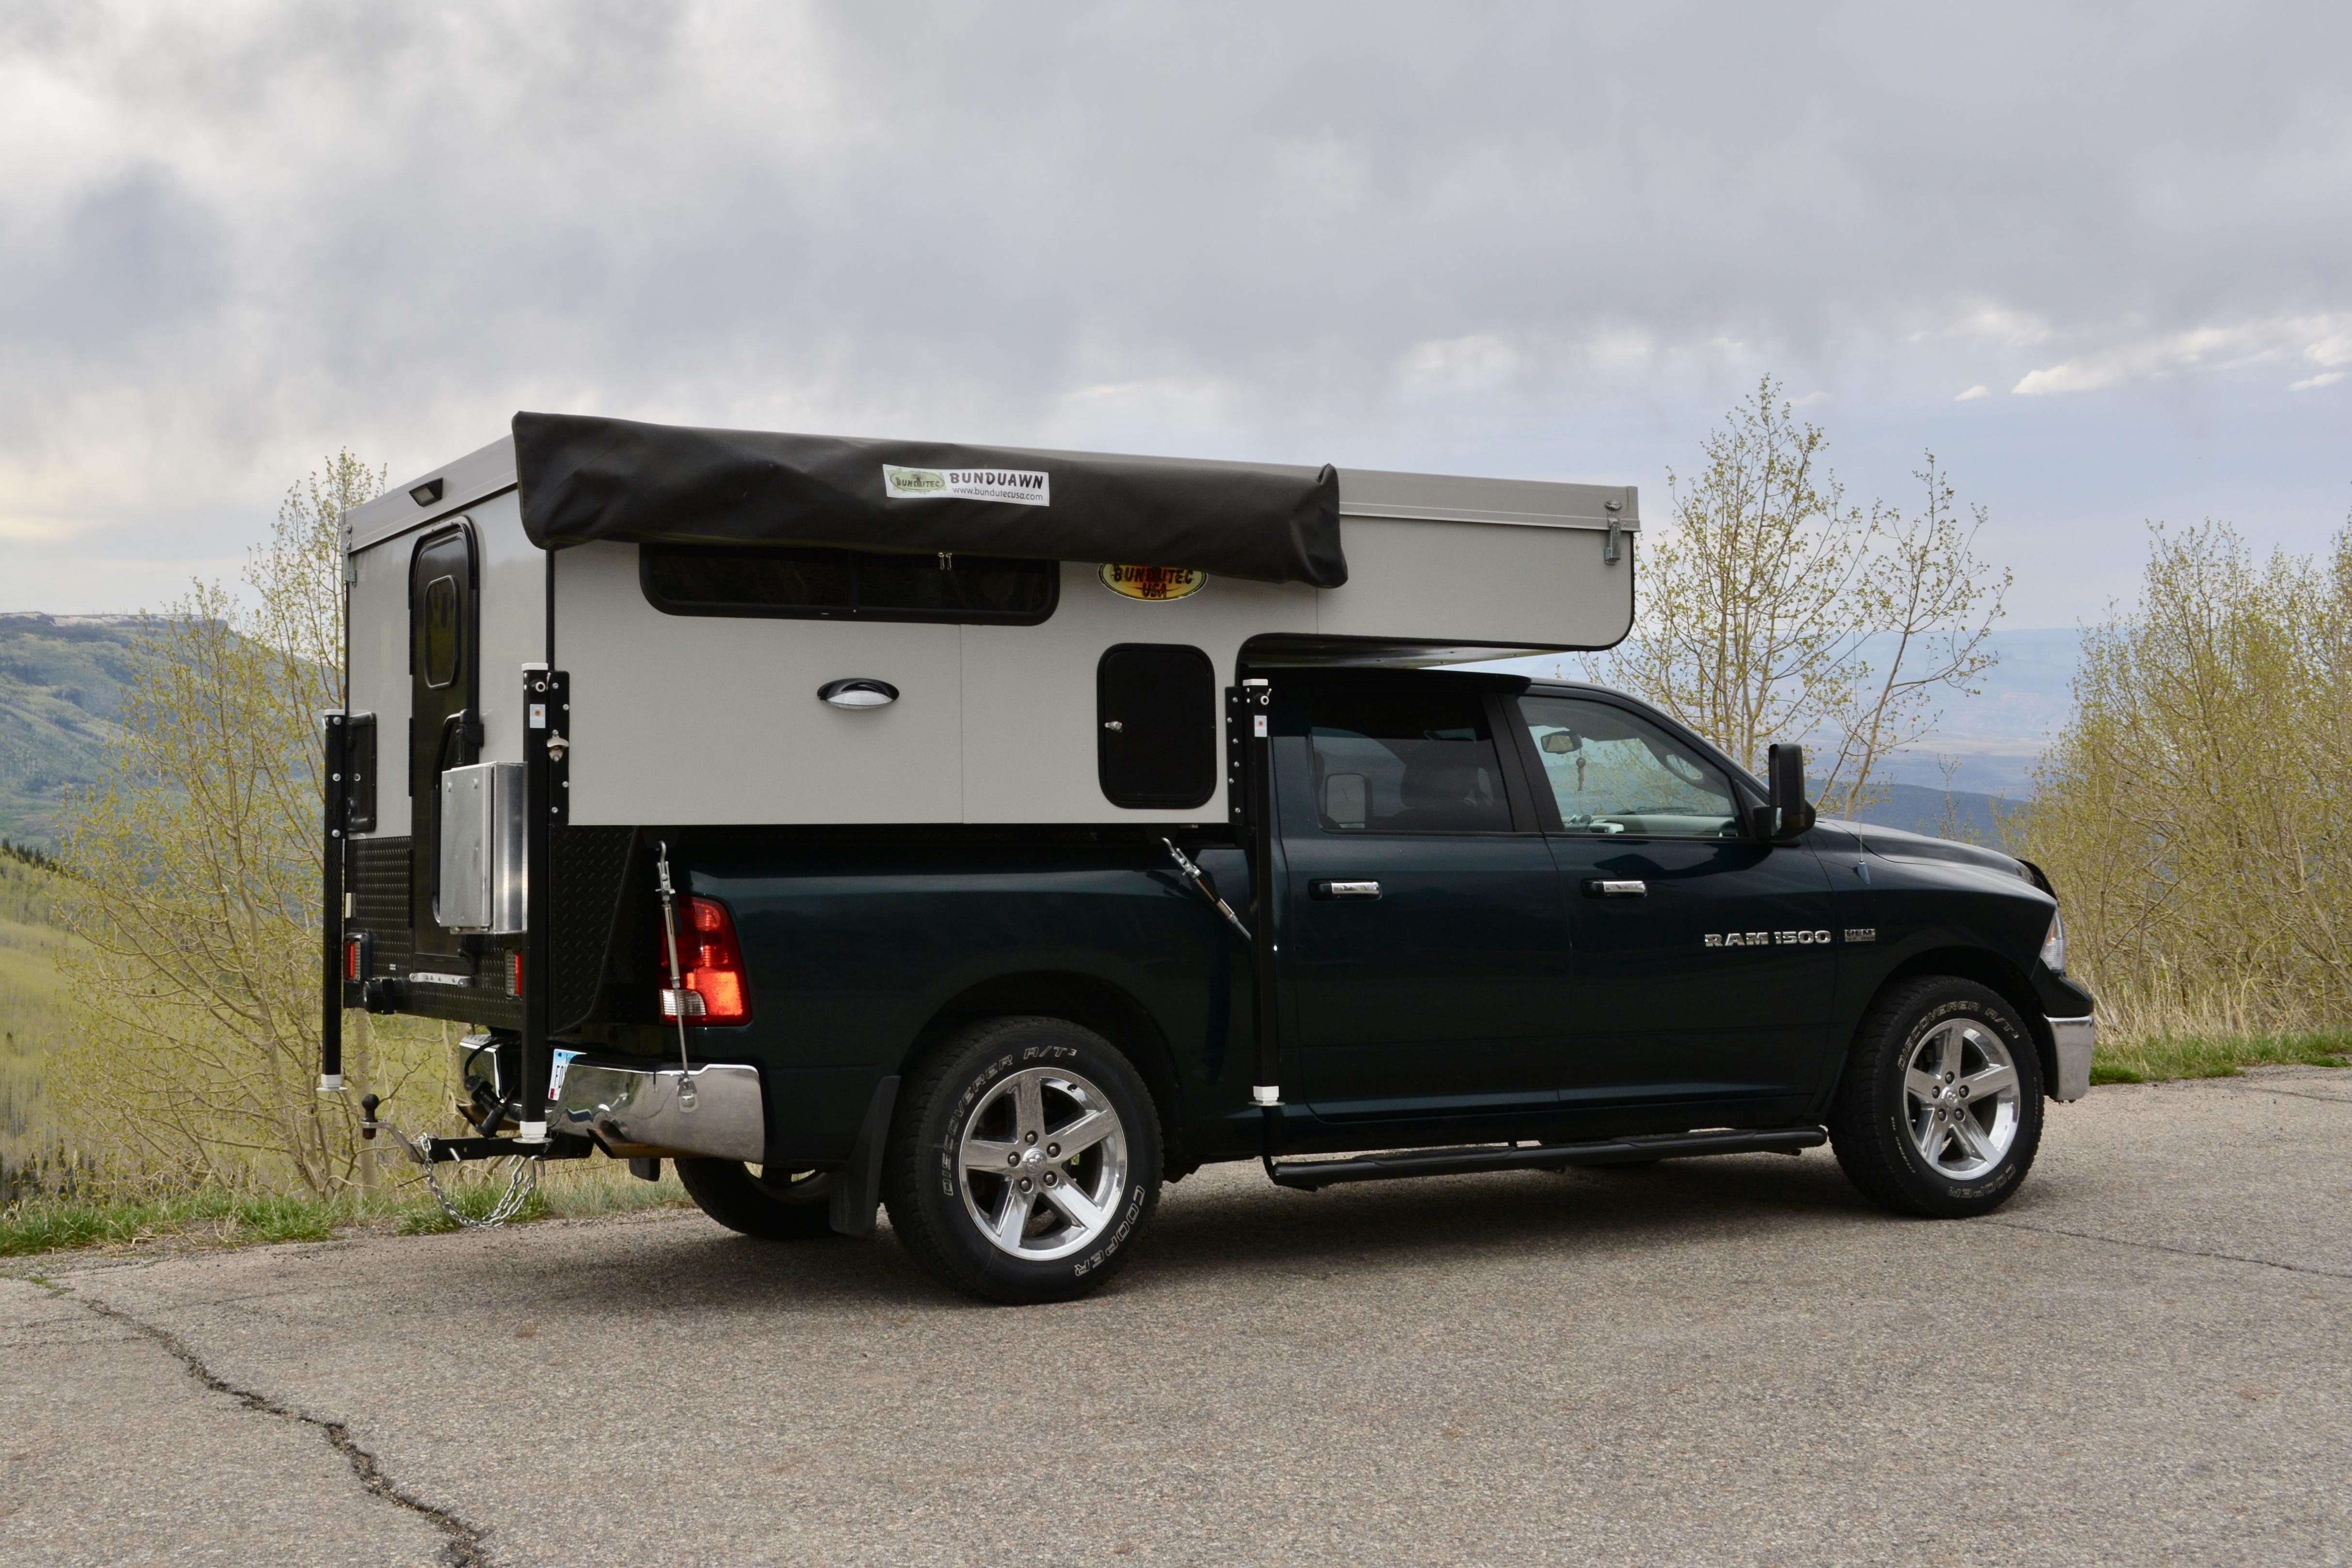 Top 8 Pop Up Truck Campers For Half Ton Trucks Truck Camper Adventure